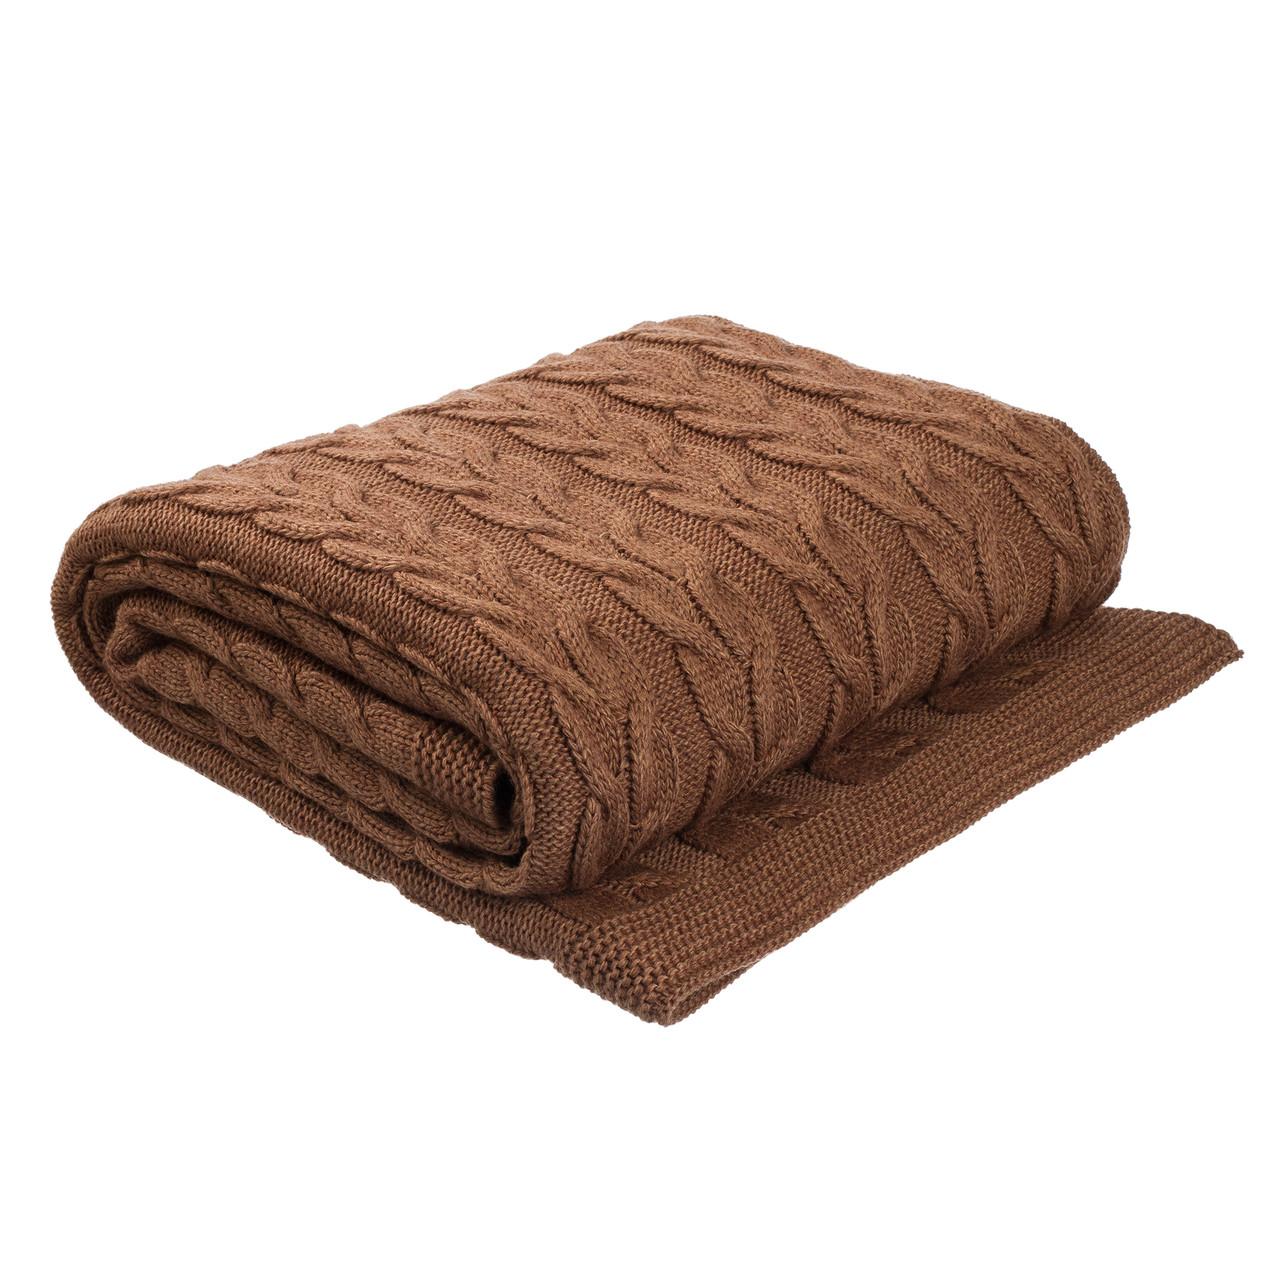 Плед вязаный Ohaina косы 190х160 Chocolate Brown